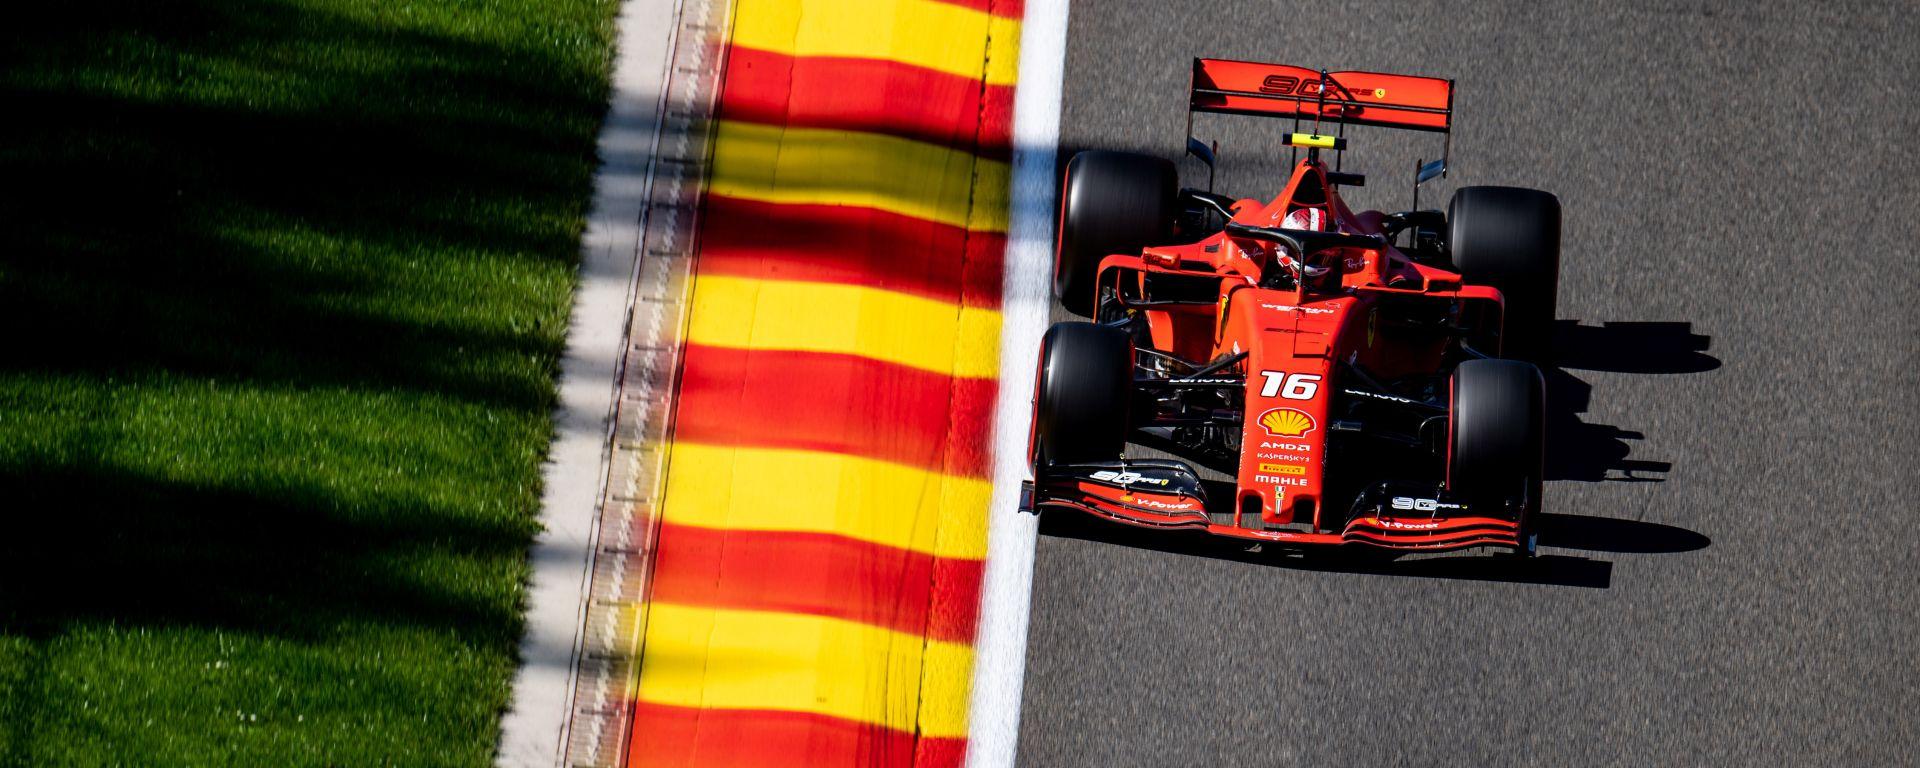 F1 GP Belgio 2019, Spa Francorchamps, Charles Leclerc (Ferrari)